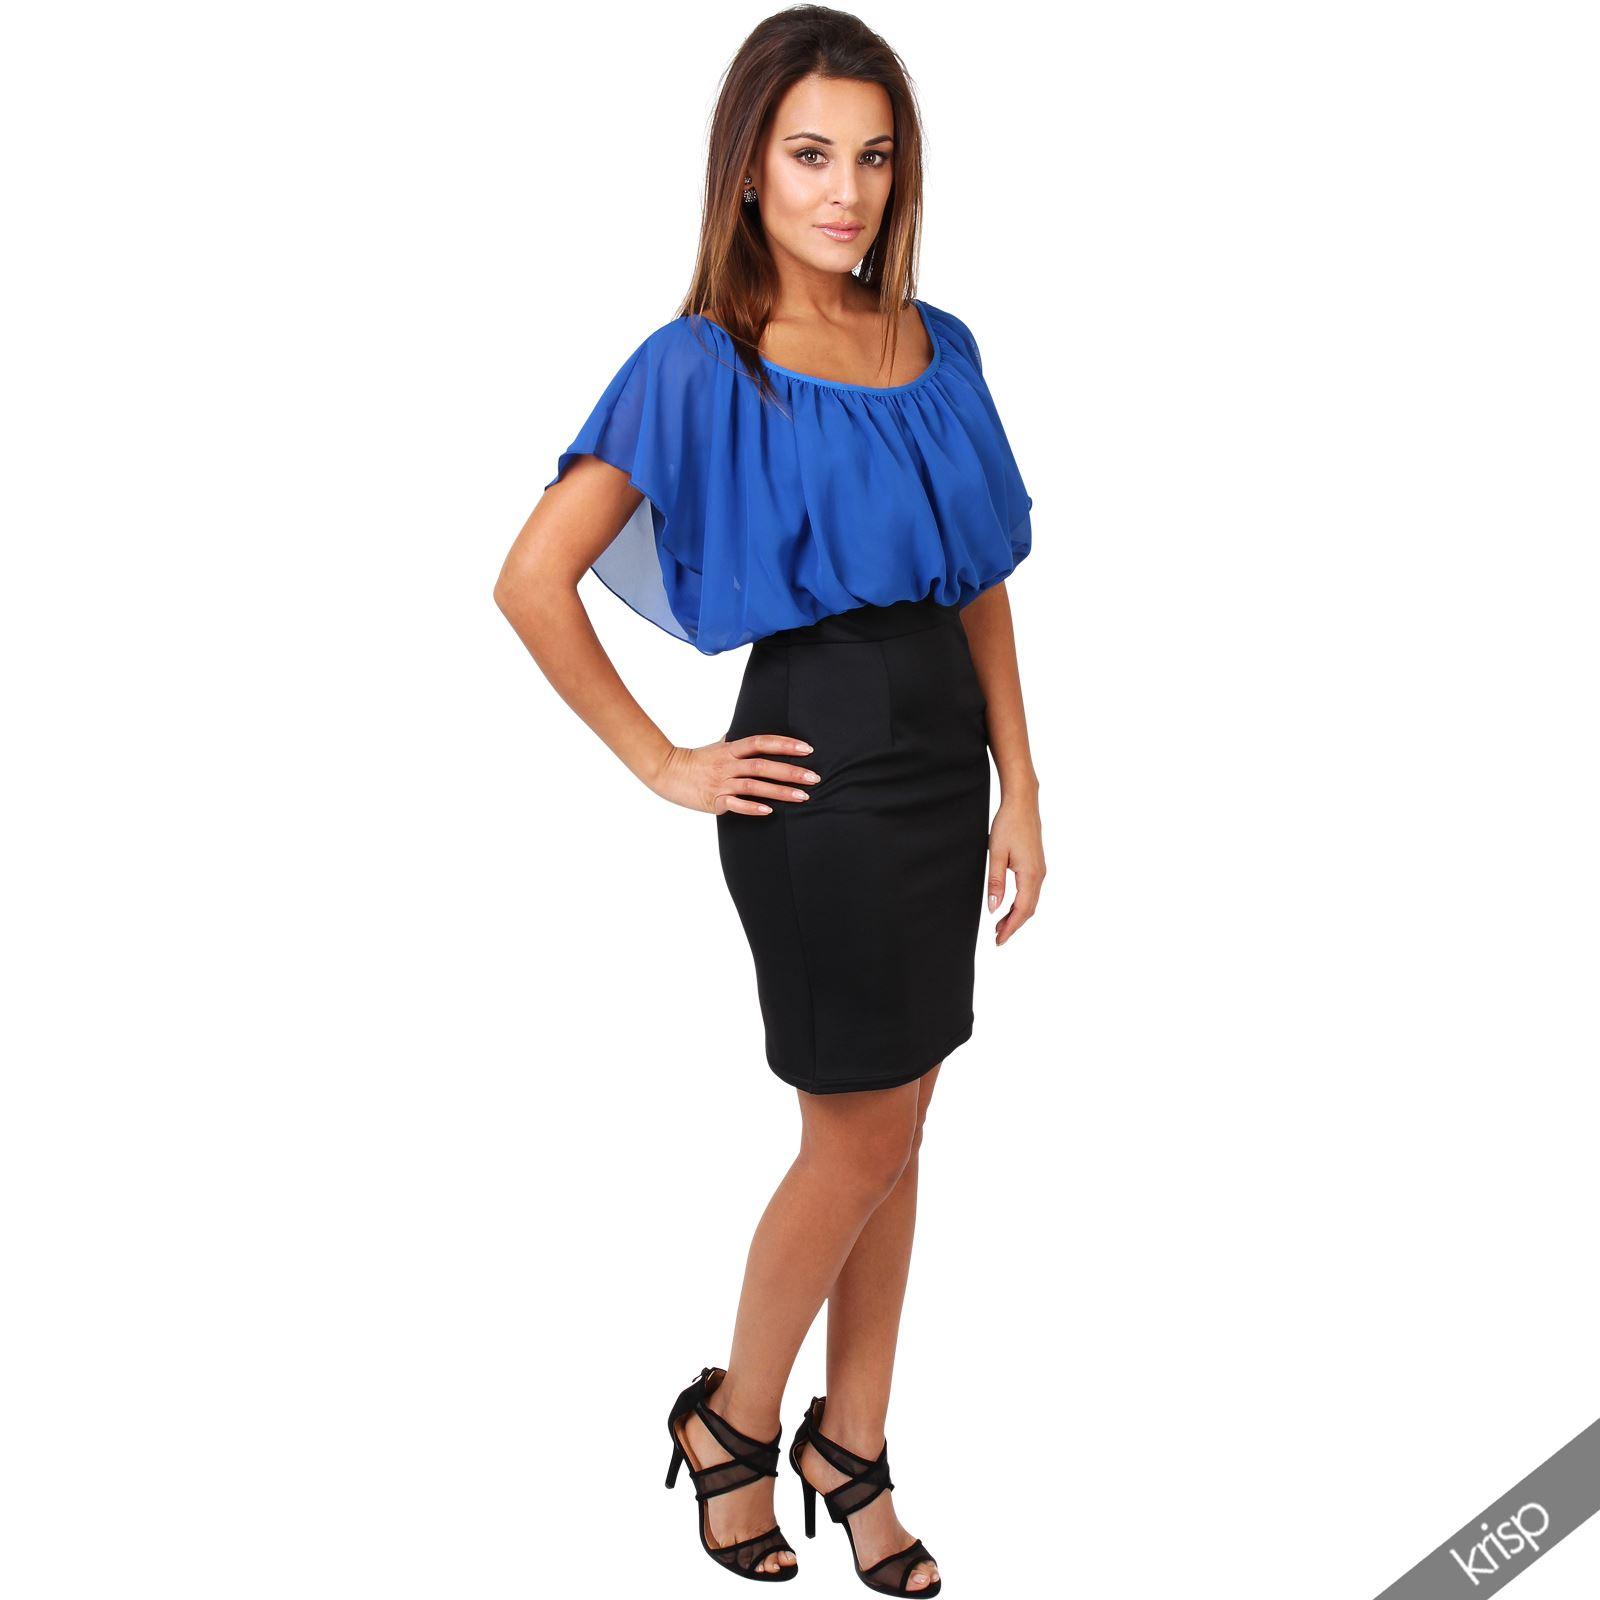 Womens-Pleated-Chiffon-Batwing-Top-High-Waist-Pencil-Bodycon-Skirt-Mini-Dress thumbnail 27